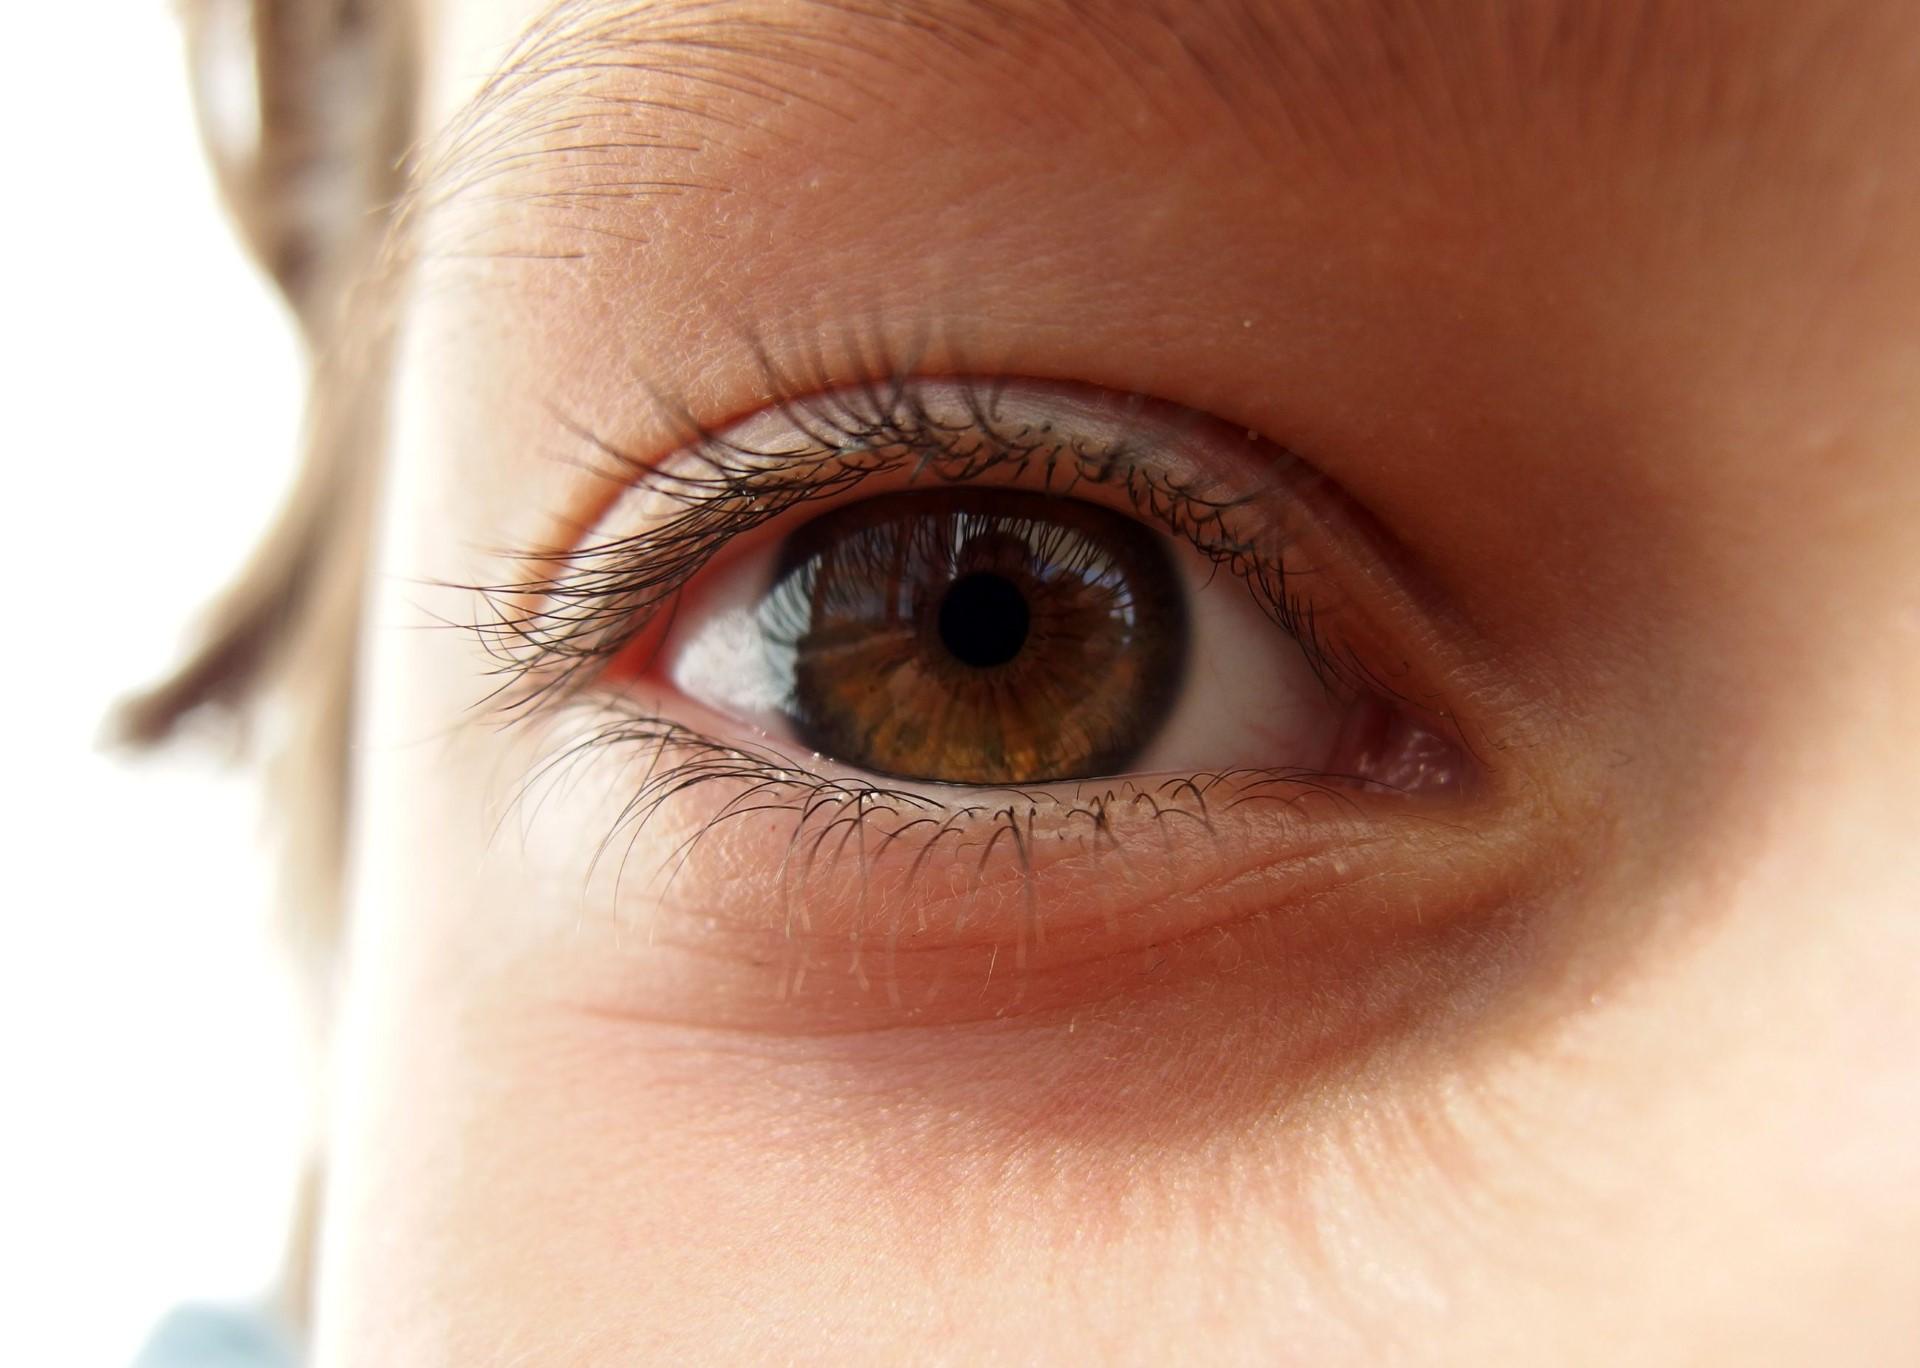 single childs eye.jpg